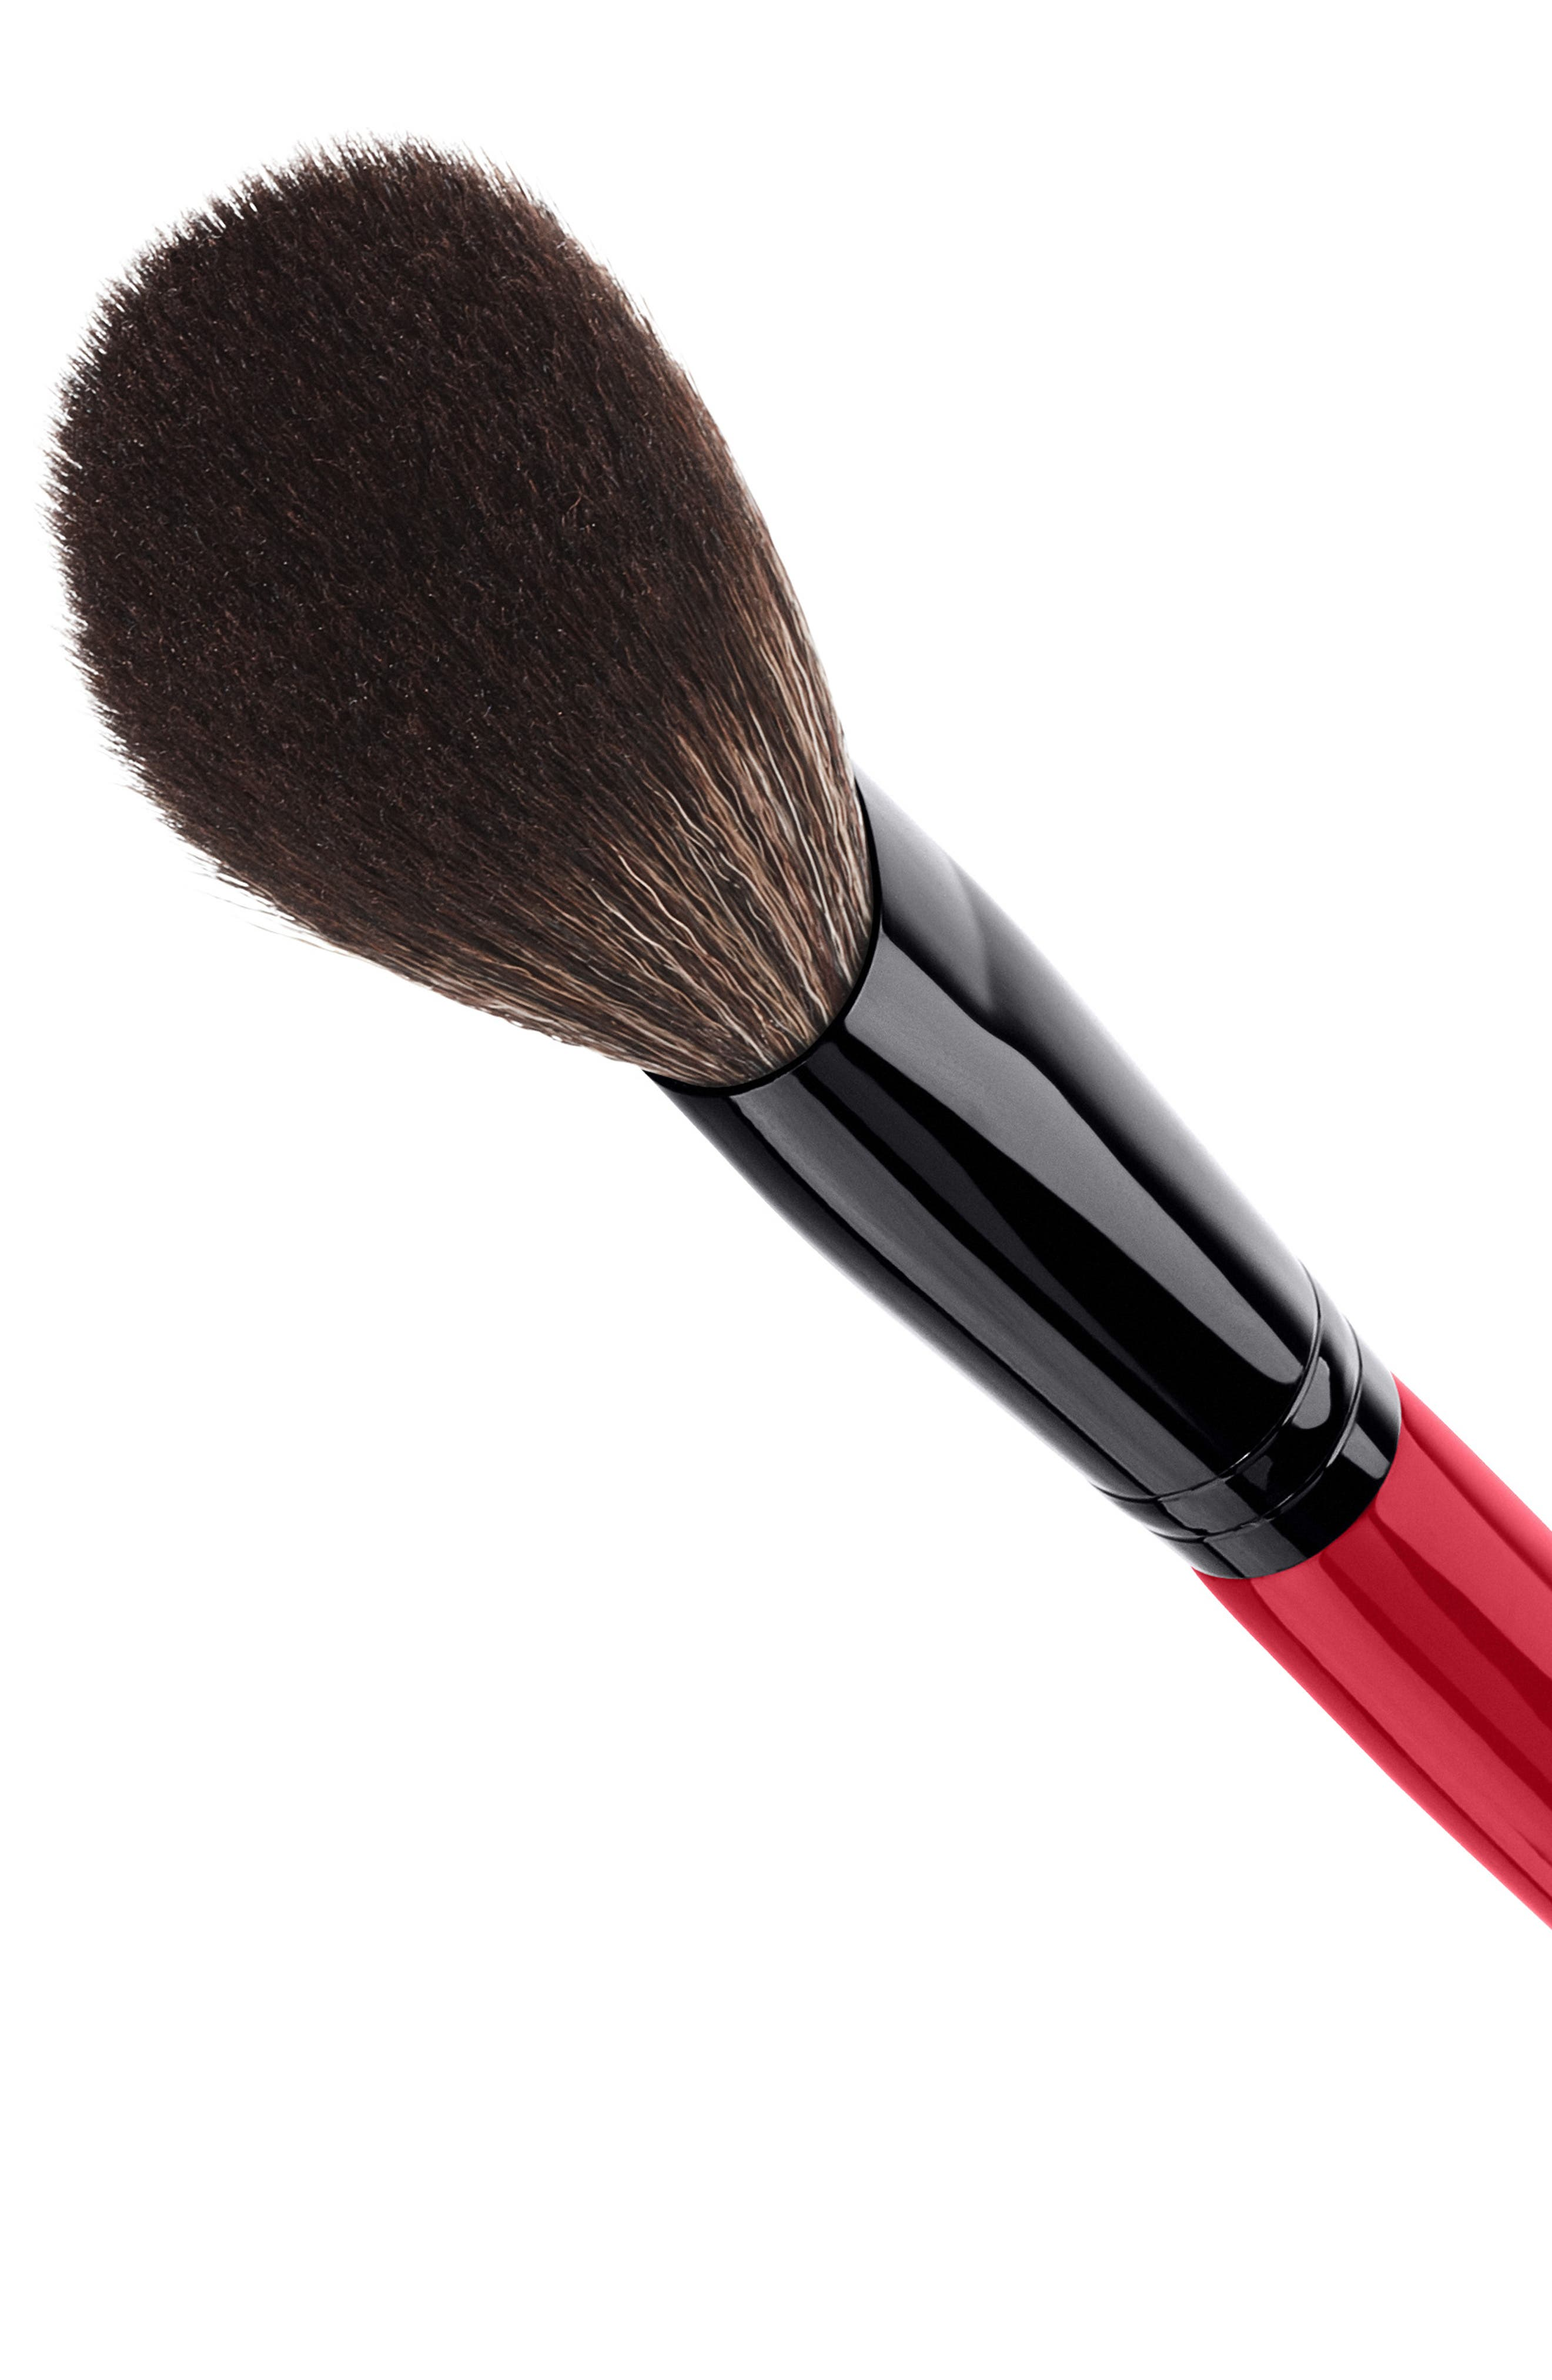 Angled Blush Brush,                             Alternate thumbnail 2, color,                             NO COLOR